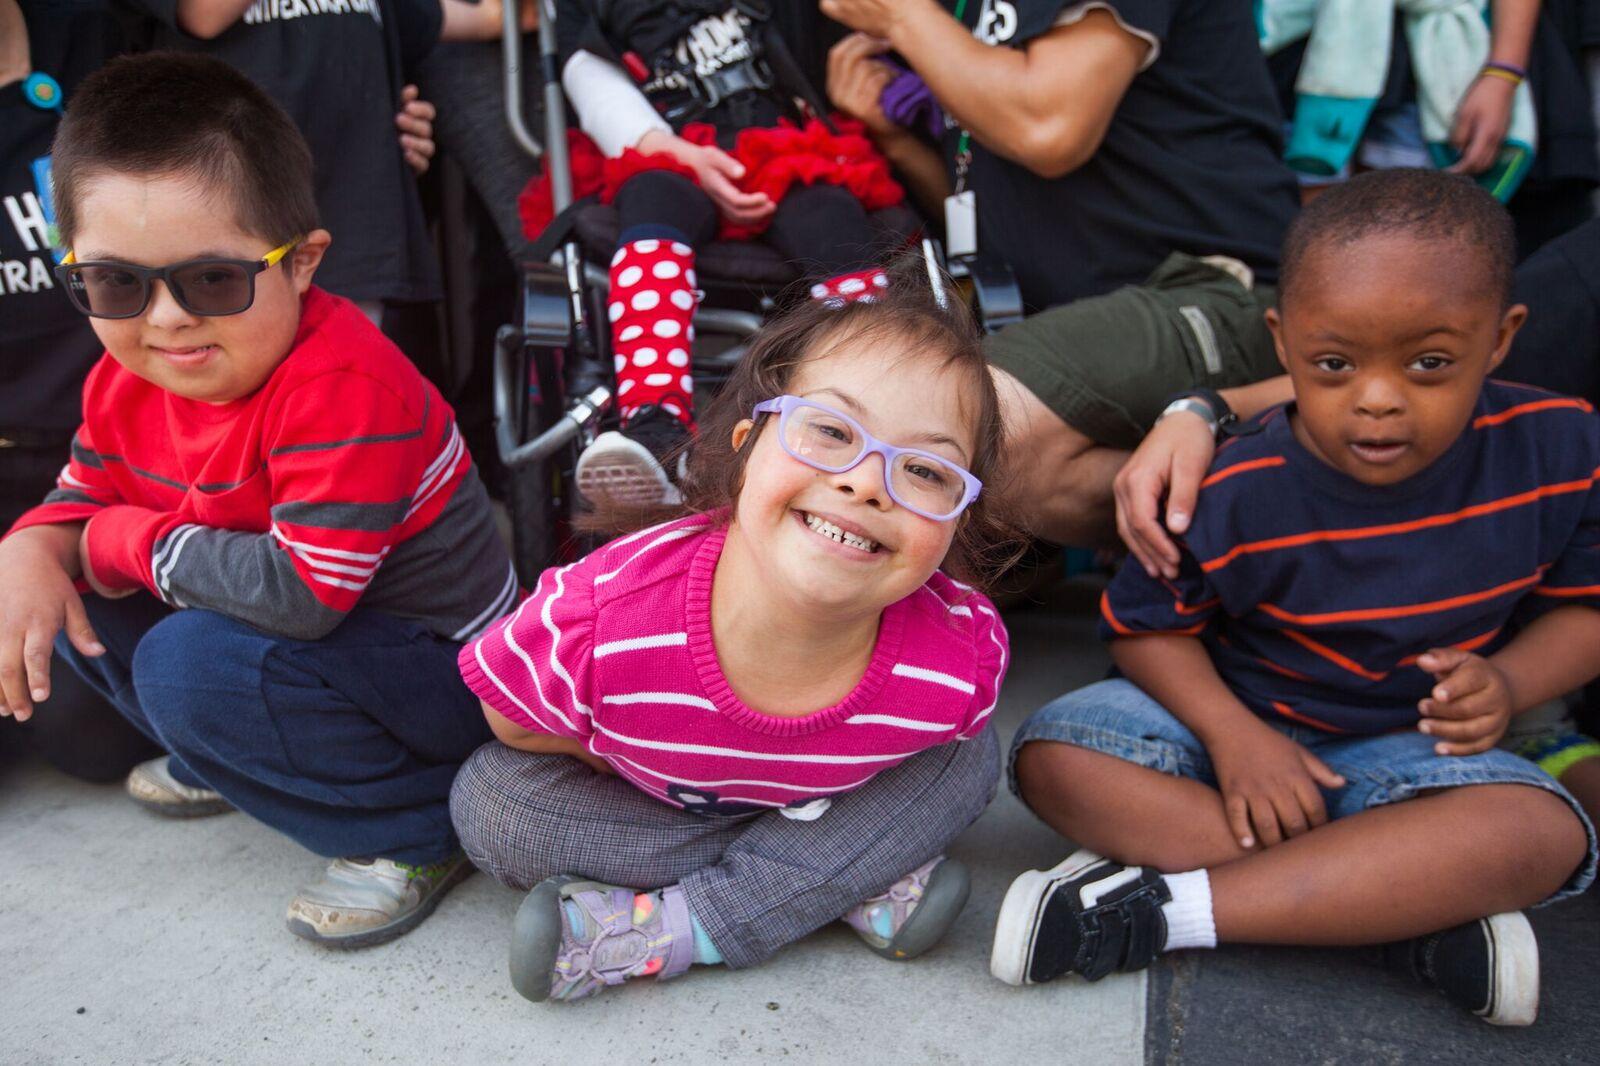 Elementary school celebrates World Down Syndrome Day